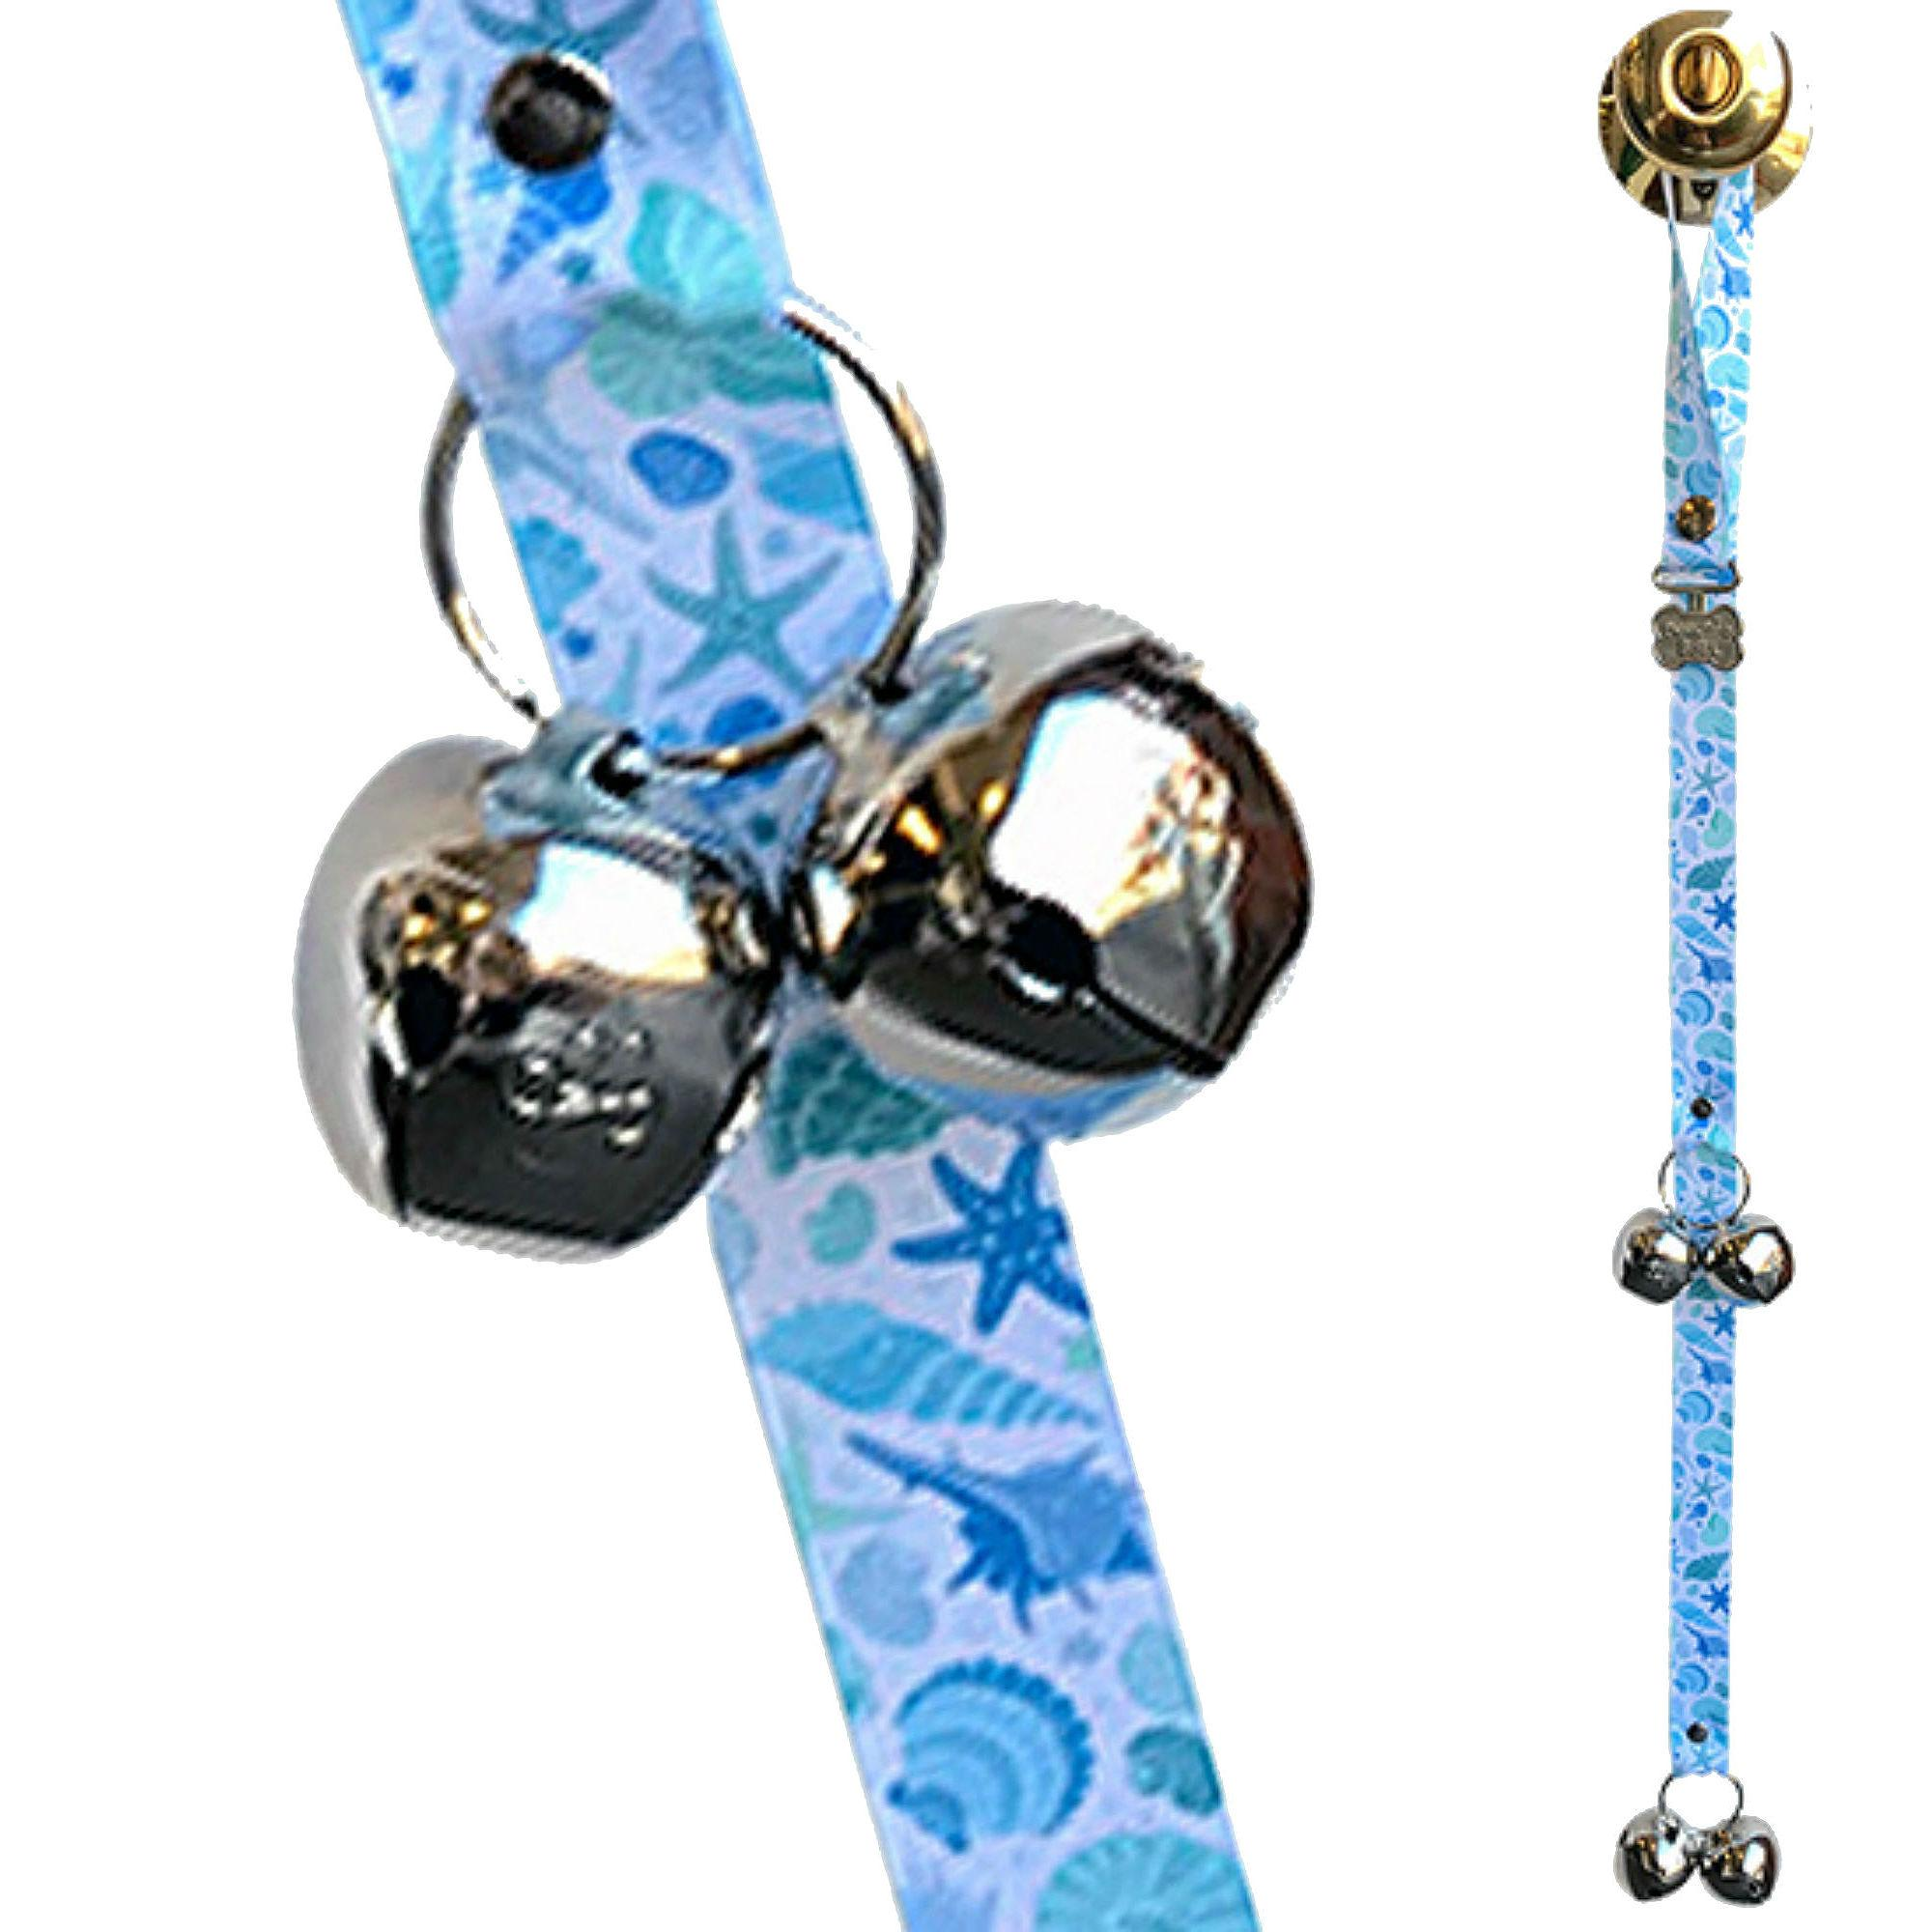 Poochie Bells Dog Doorbell Coastal Collection - Sea Shells